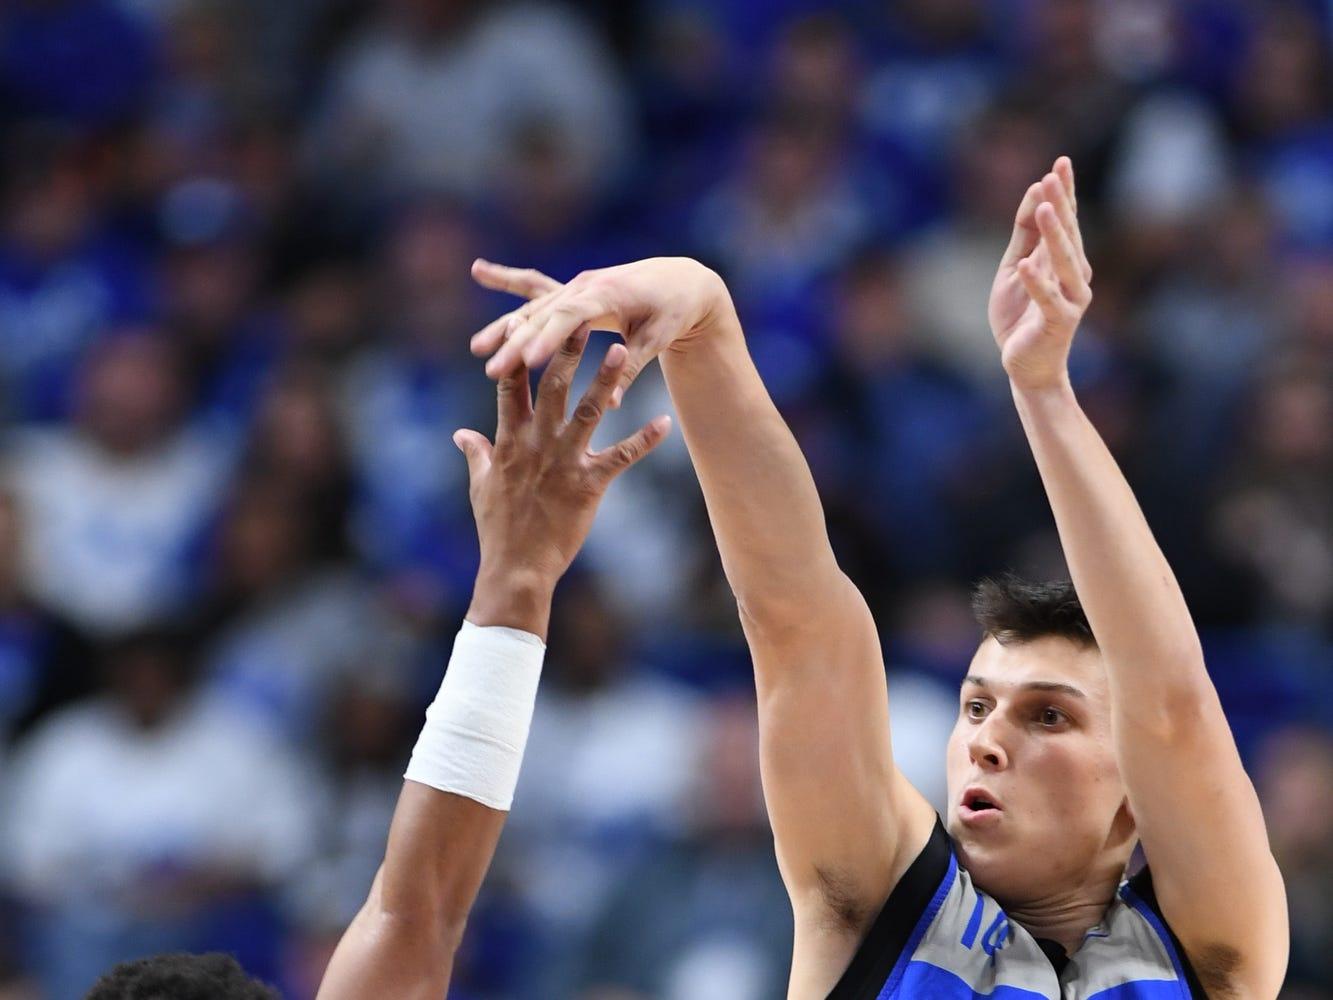 UK G Tyler Herro shoots the ball during the University of Kentucky mens basketball Blue/White game at Rupp Arena in Lexington, Kentucky on Sunday, October 21, 2018.